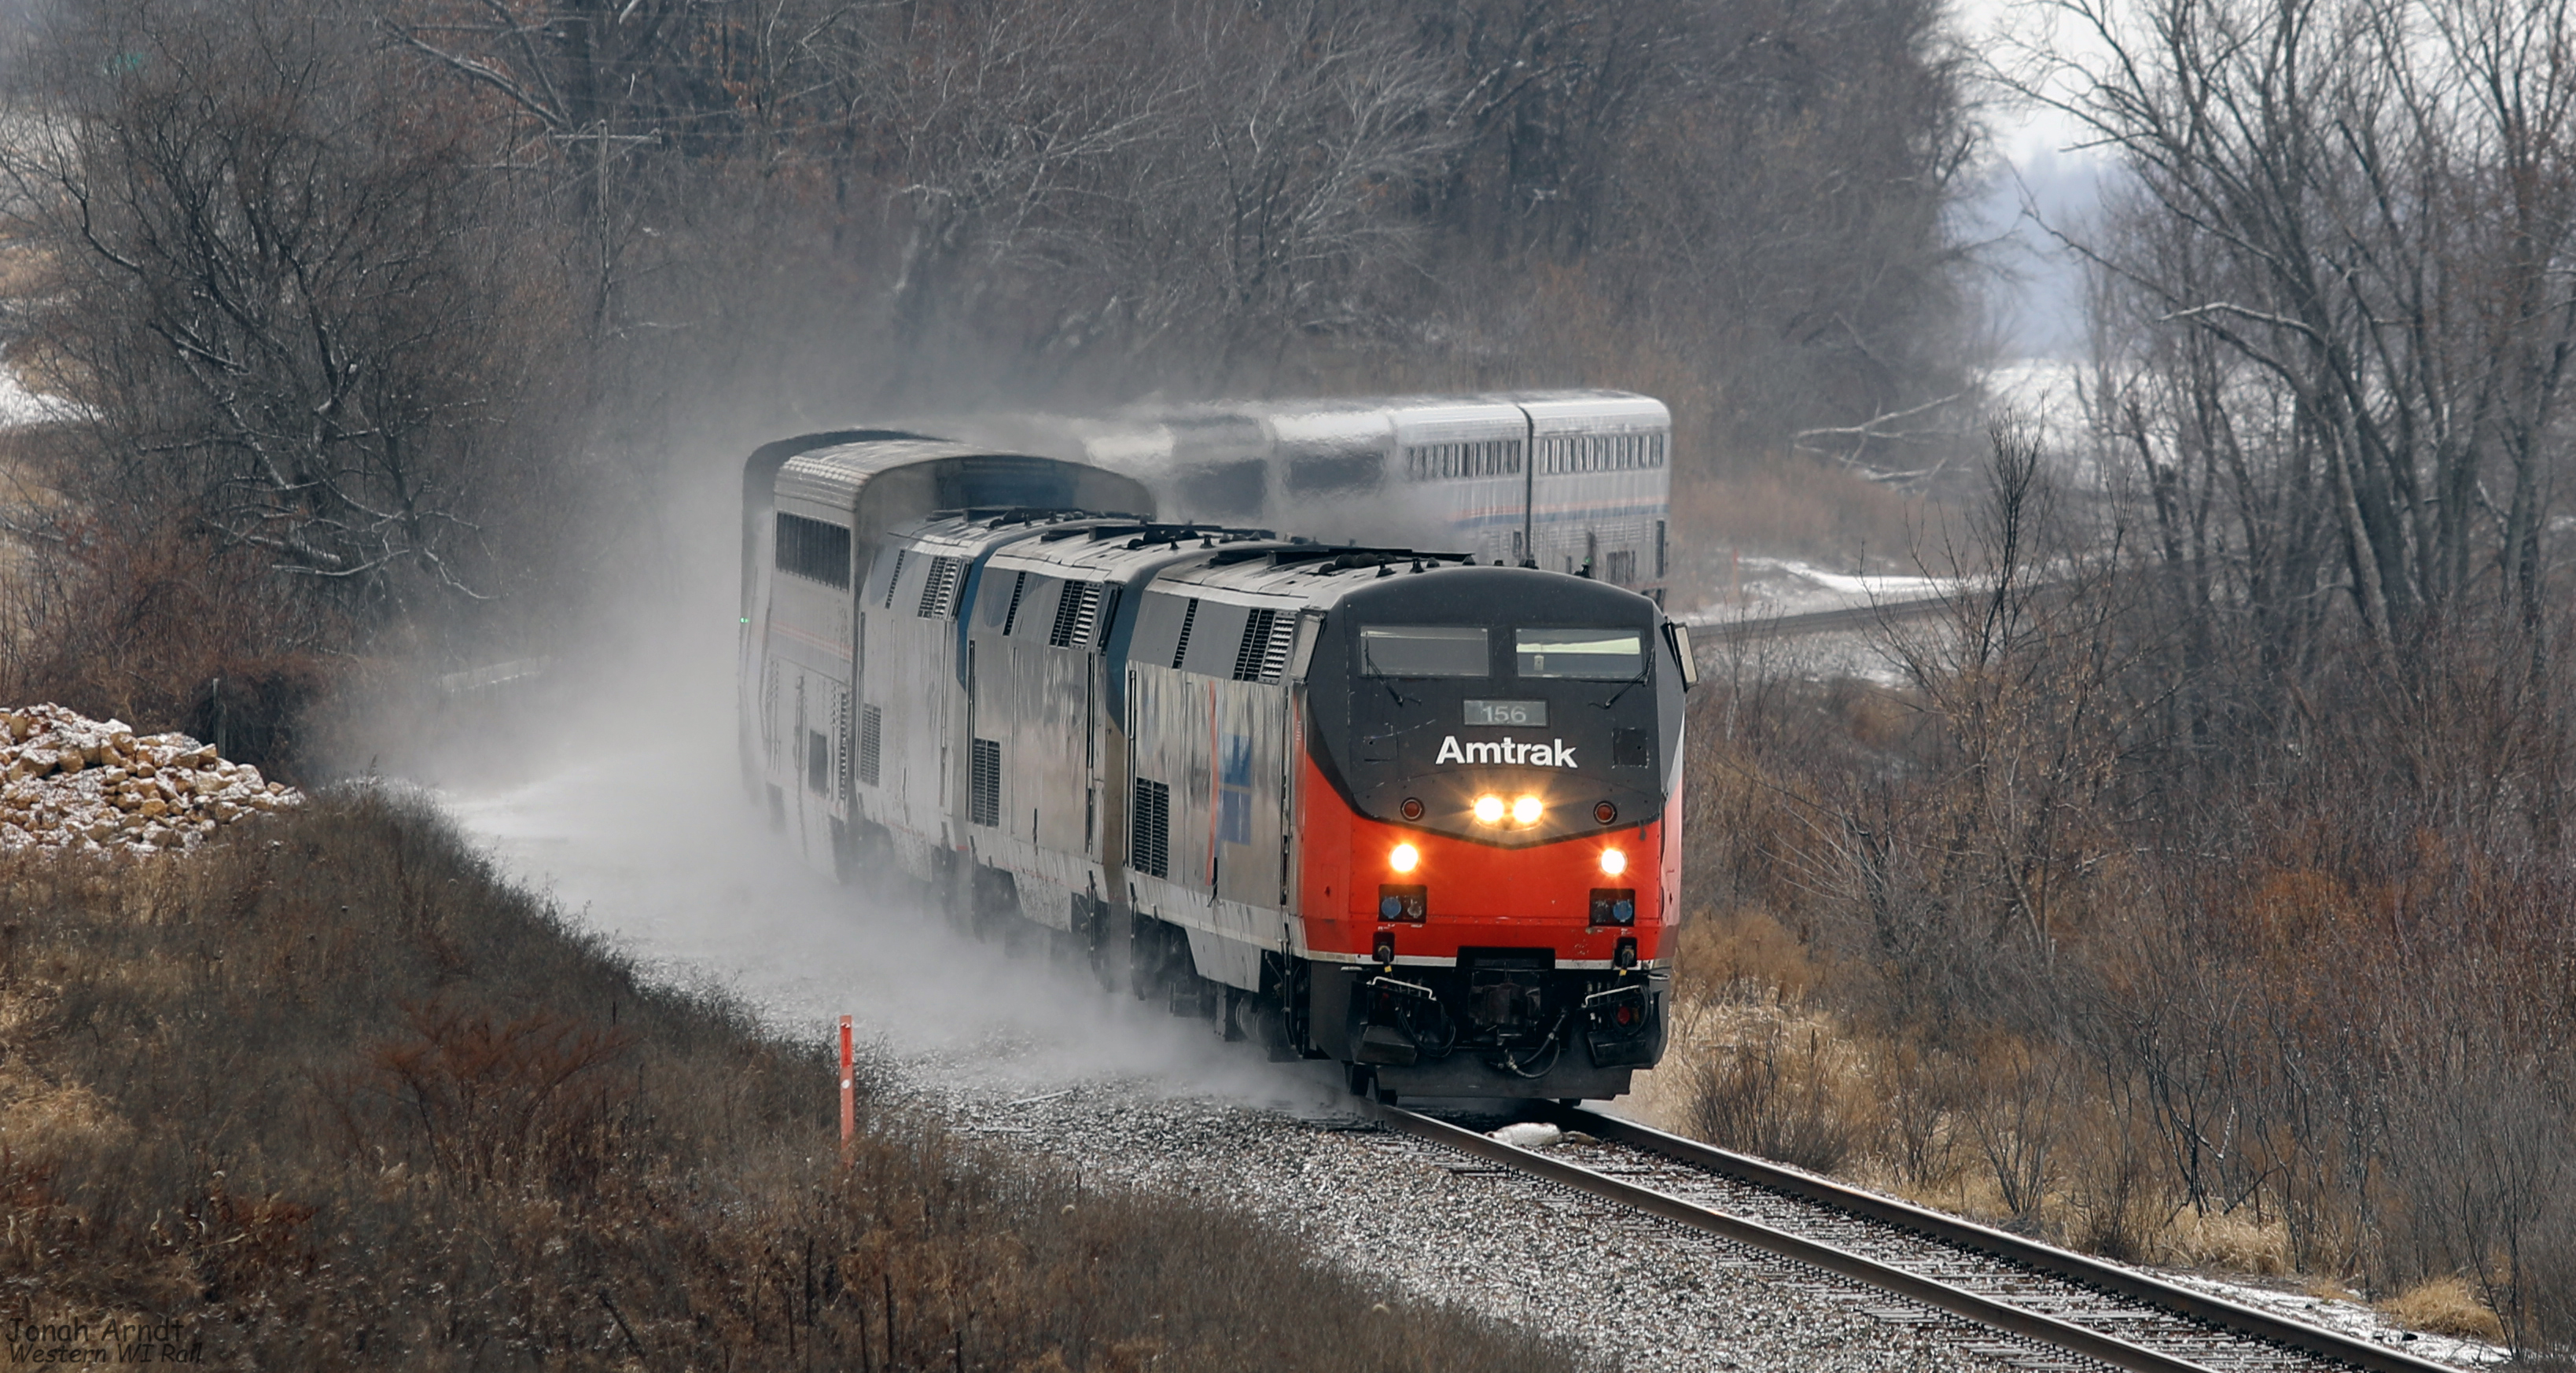 Amtrak 156